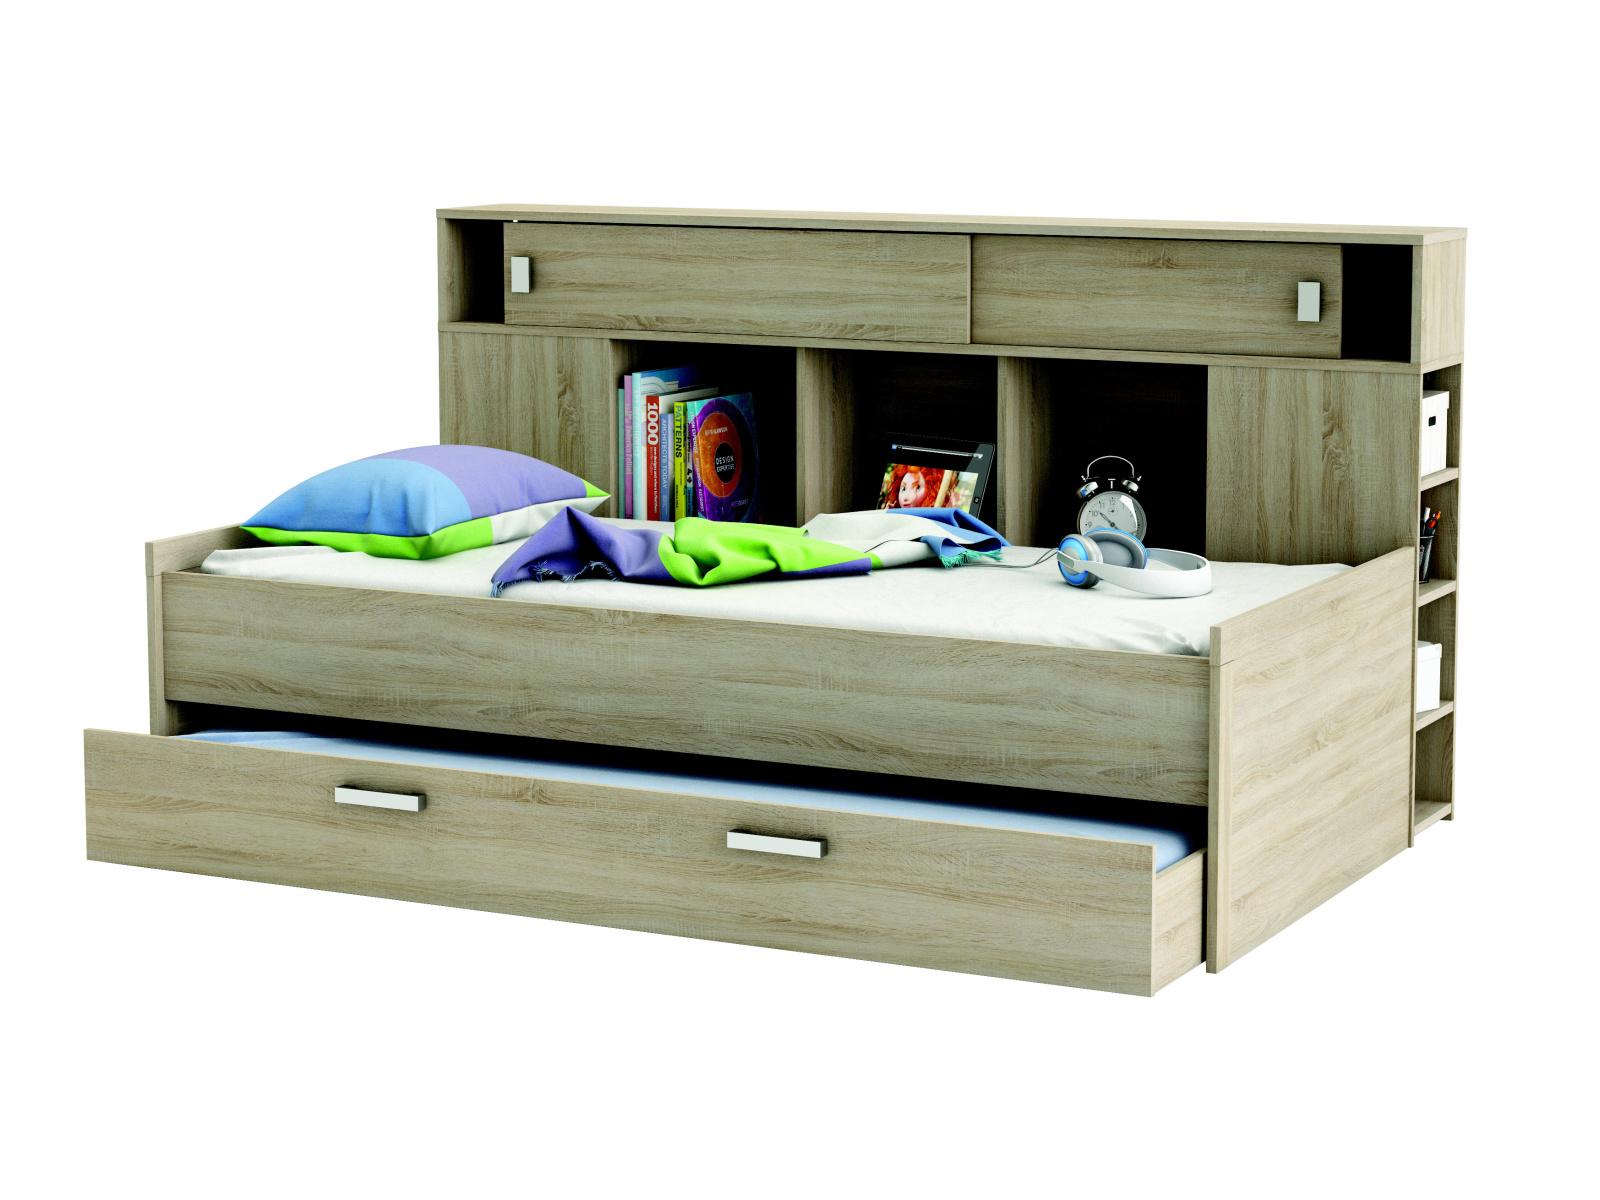 DEMEYERE SCHERWOOD, postel 90x200 cm s přistýlkou, dub sonoma